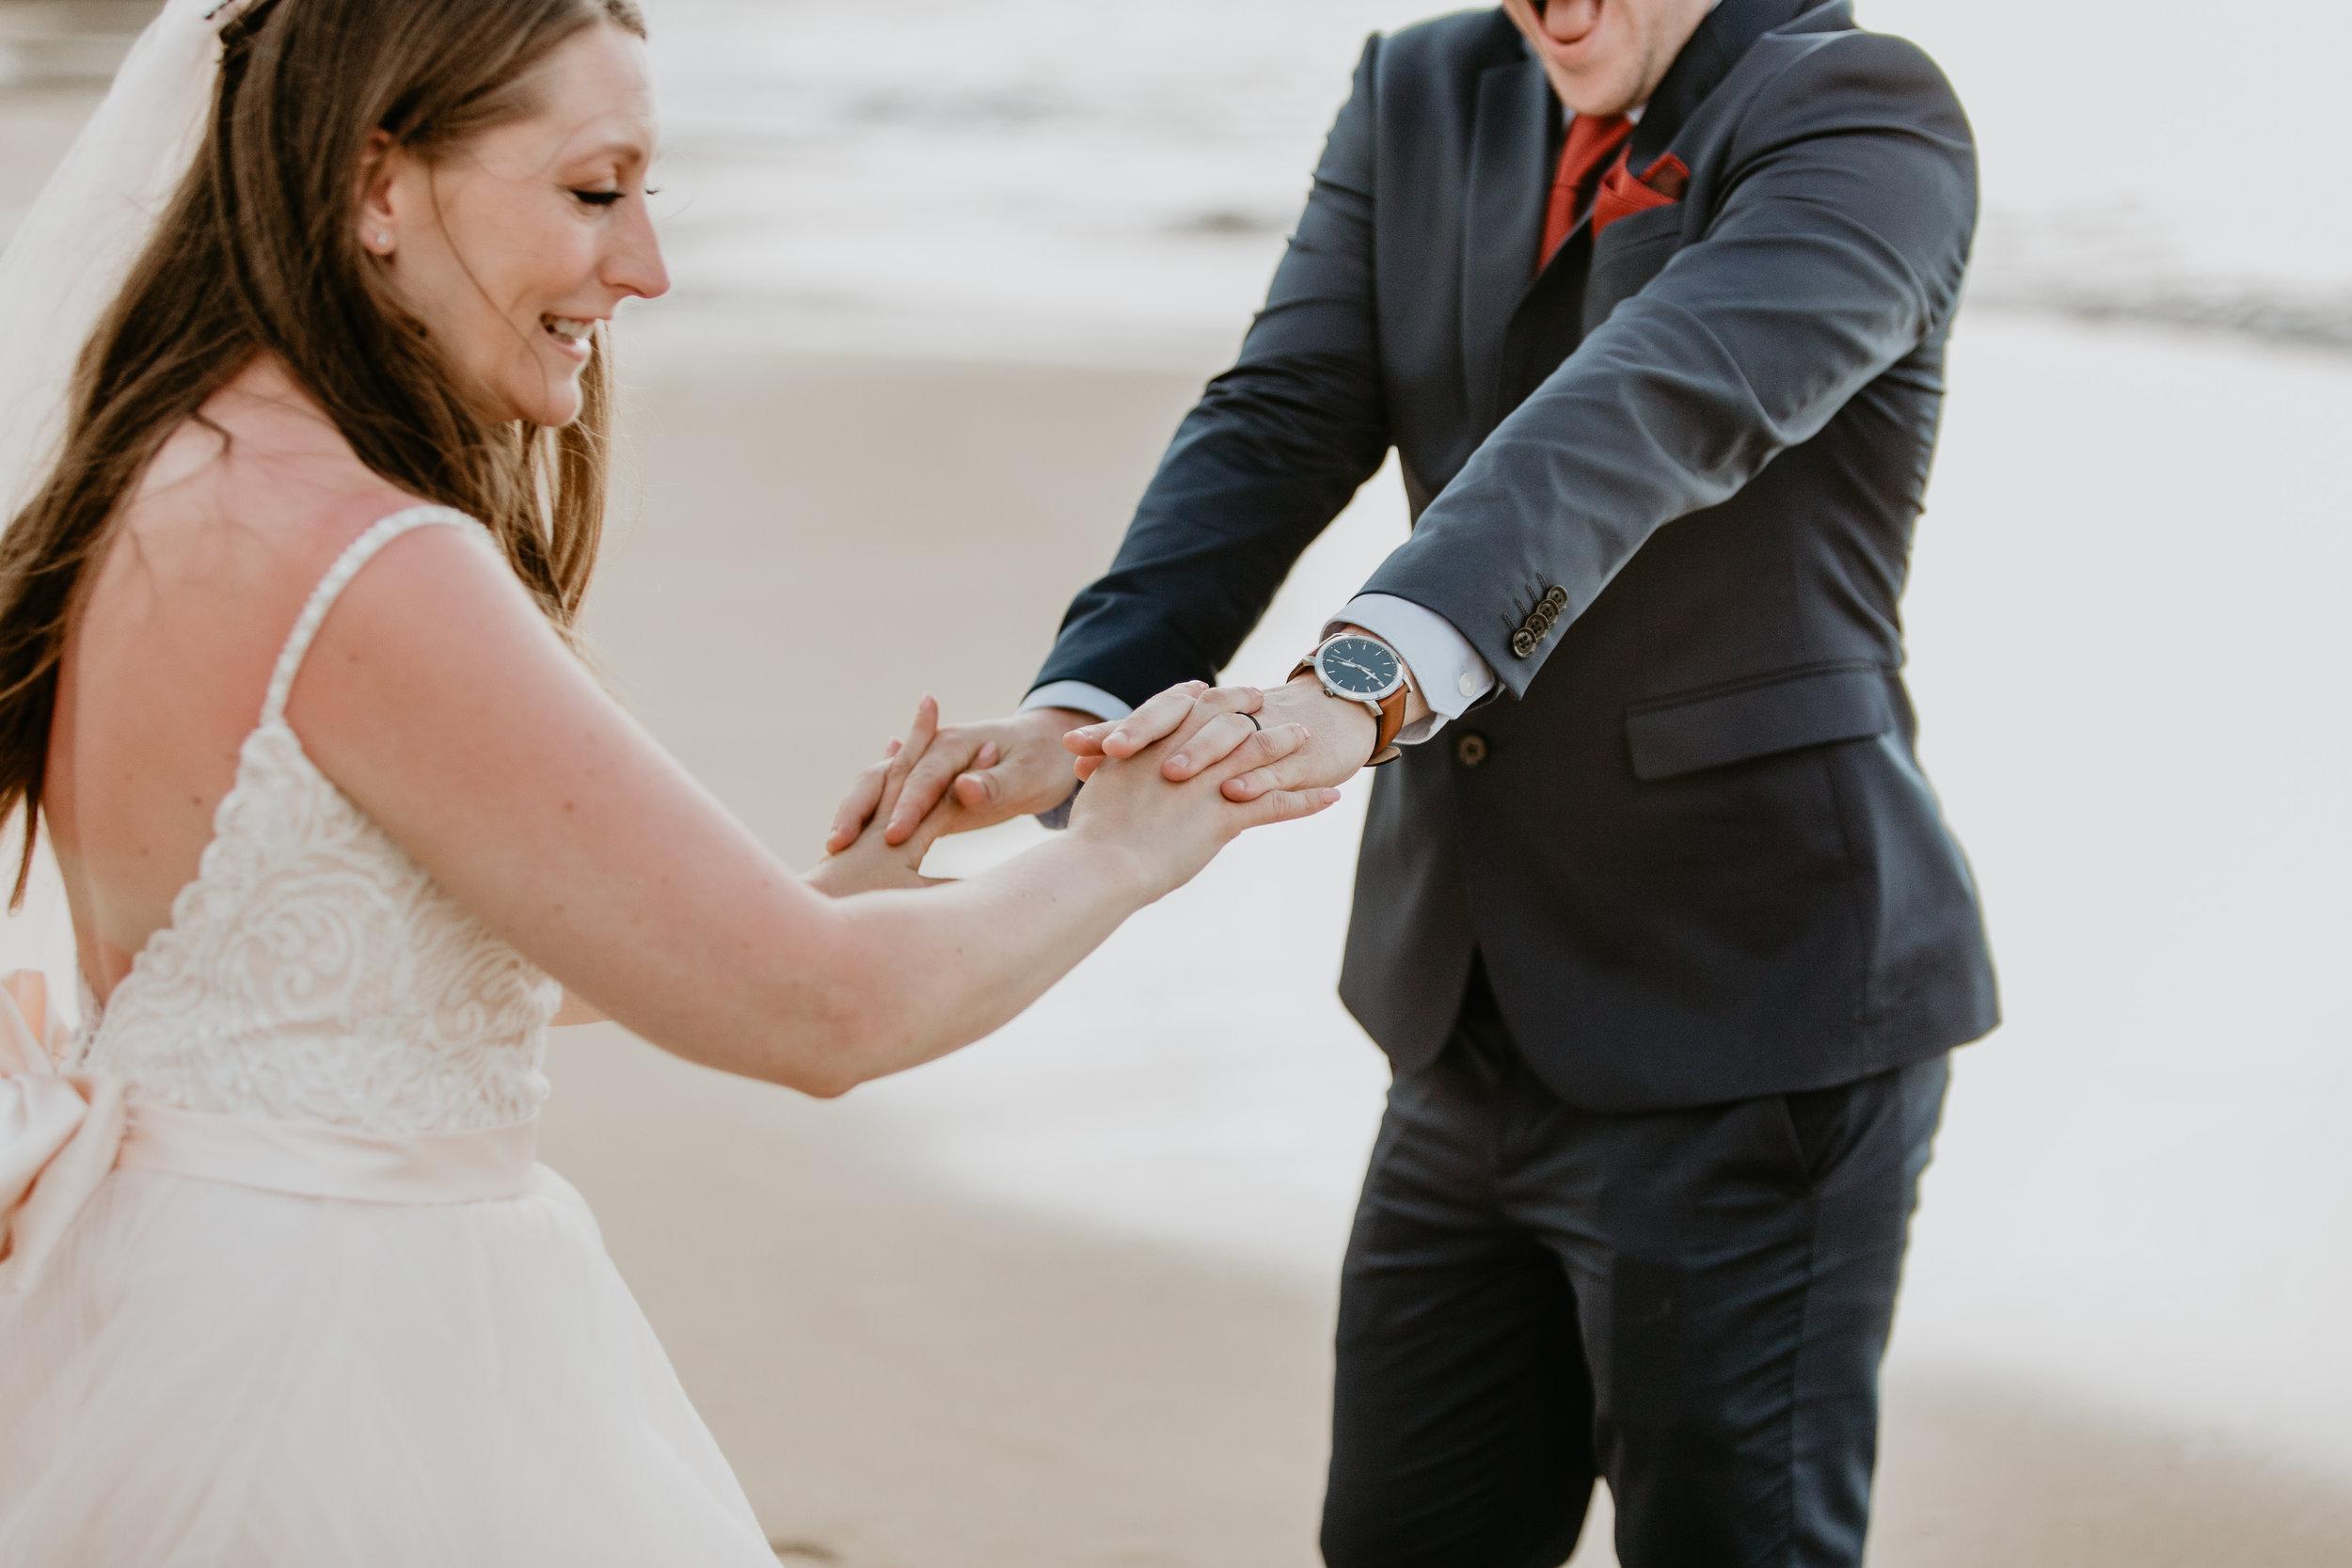 nicole-daacke-photography-destination-wedding-in-st-lucia-sandals-la-toc-intimate-island-wedding-carribean-elopement-photographer-chill-island-wedding-92.jpg